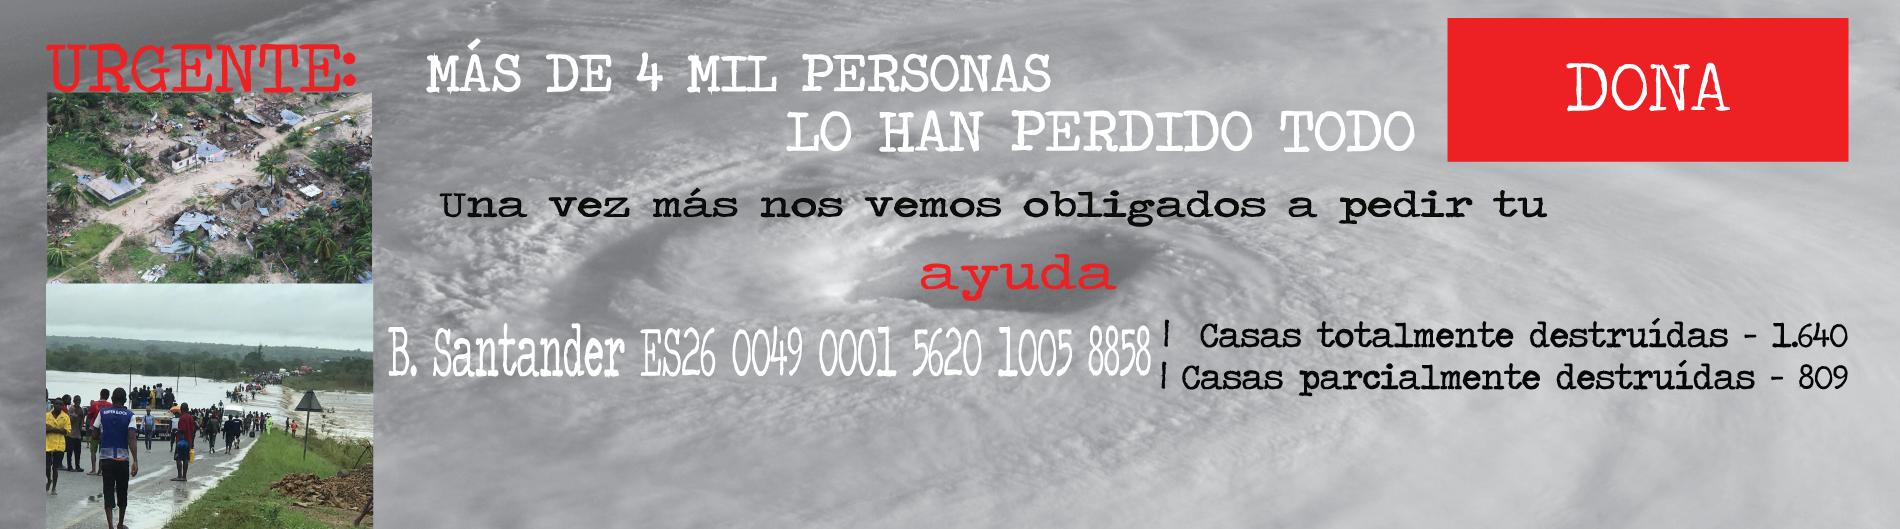 emergencia mozambique ciclón kenneth solidaridad